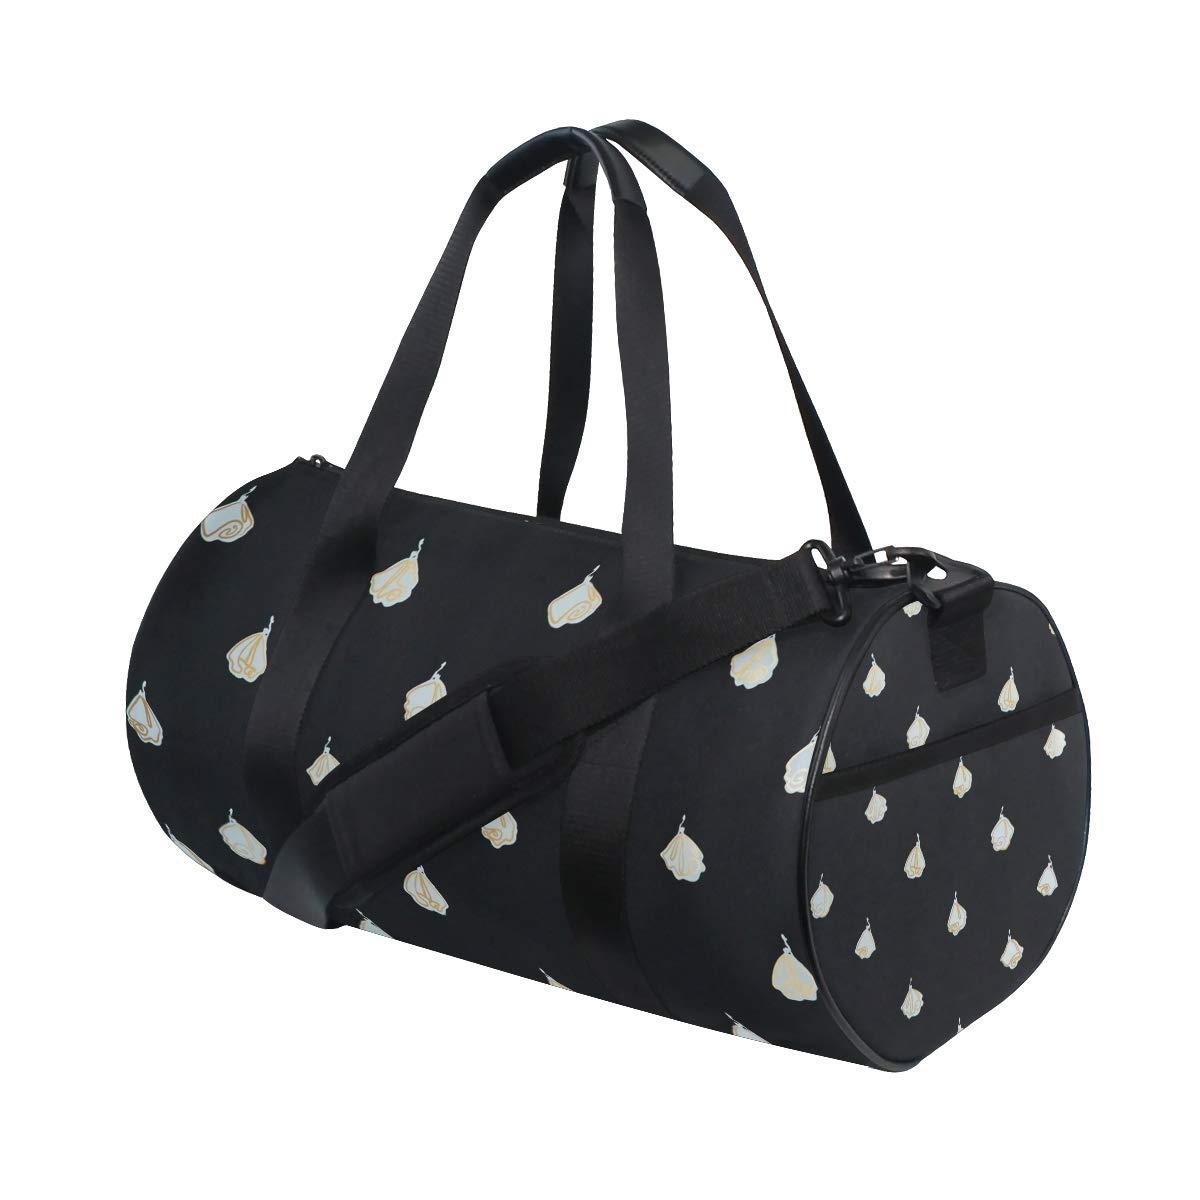 OuLian Gym Bag Most Beautiful White Roses Women Canvas Duffel Bag Cute Sports Bag for Girls